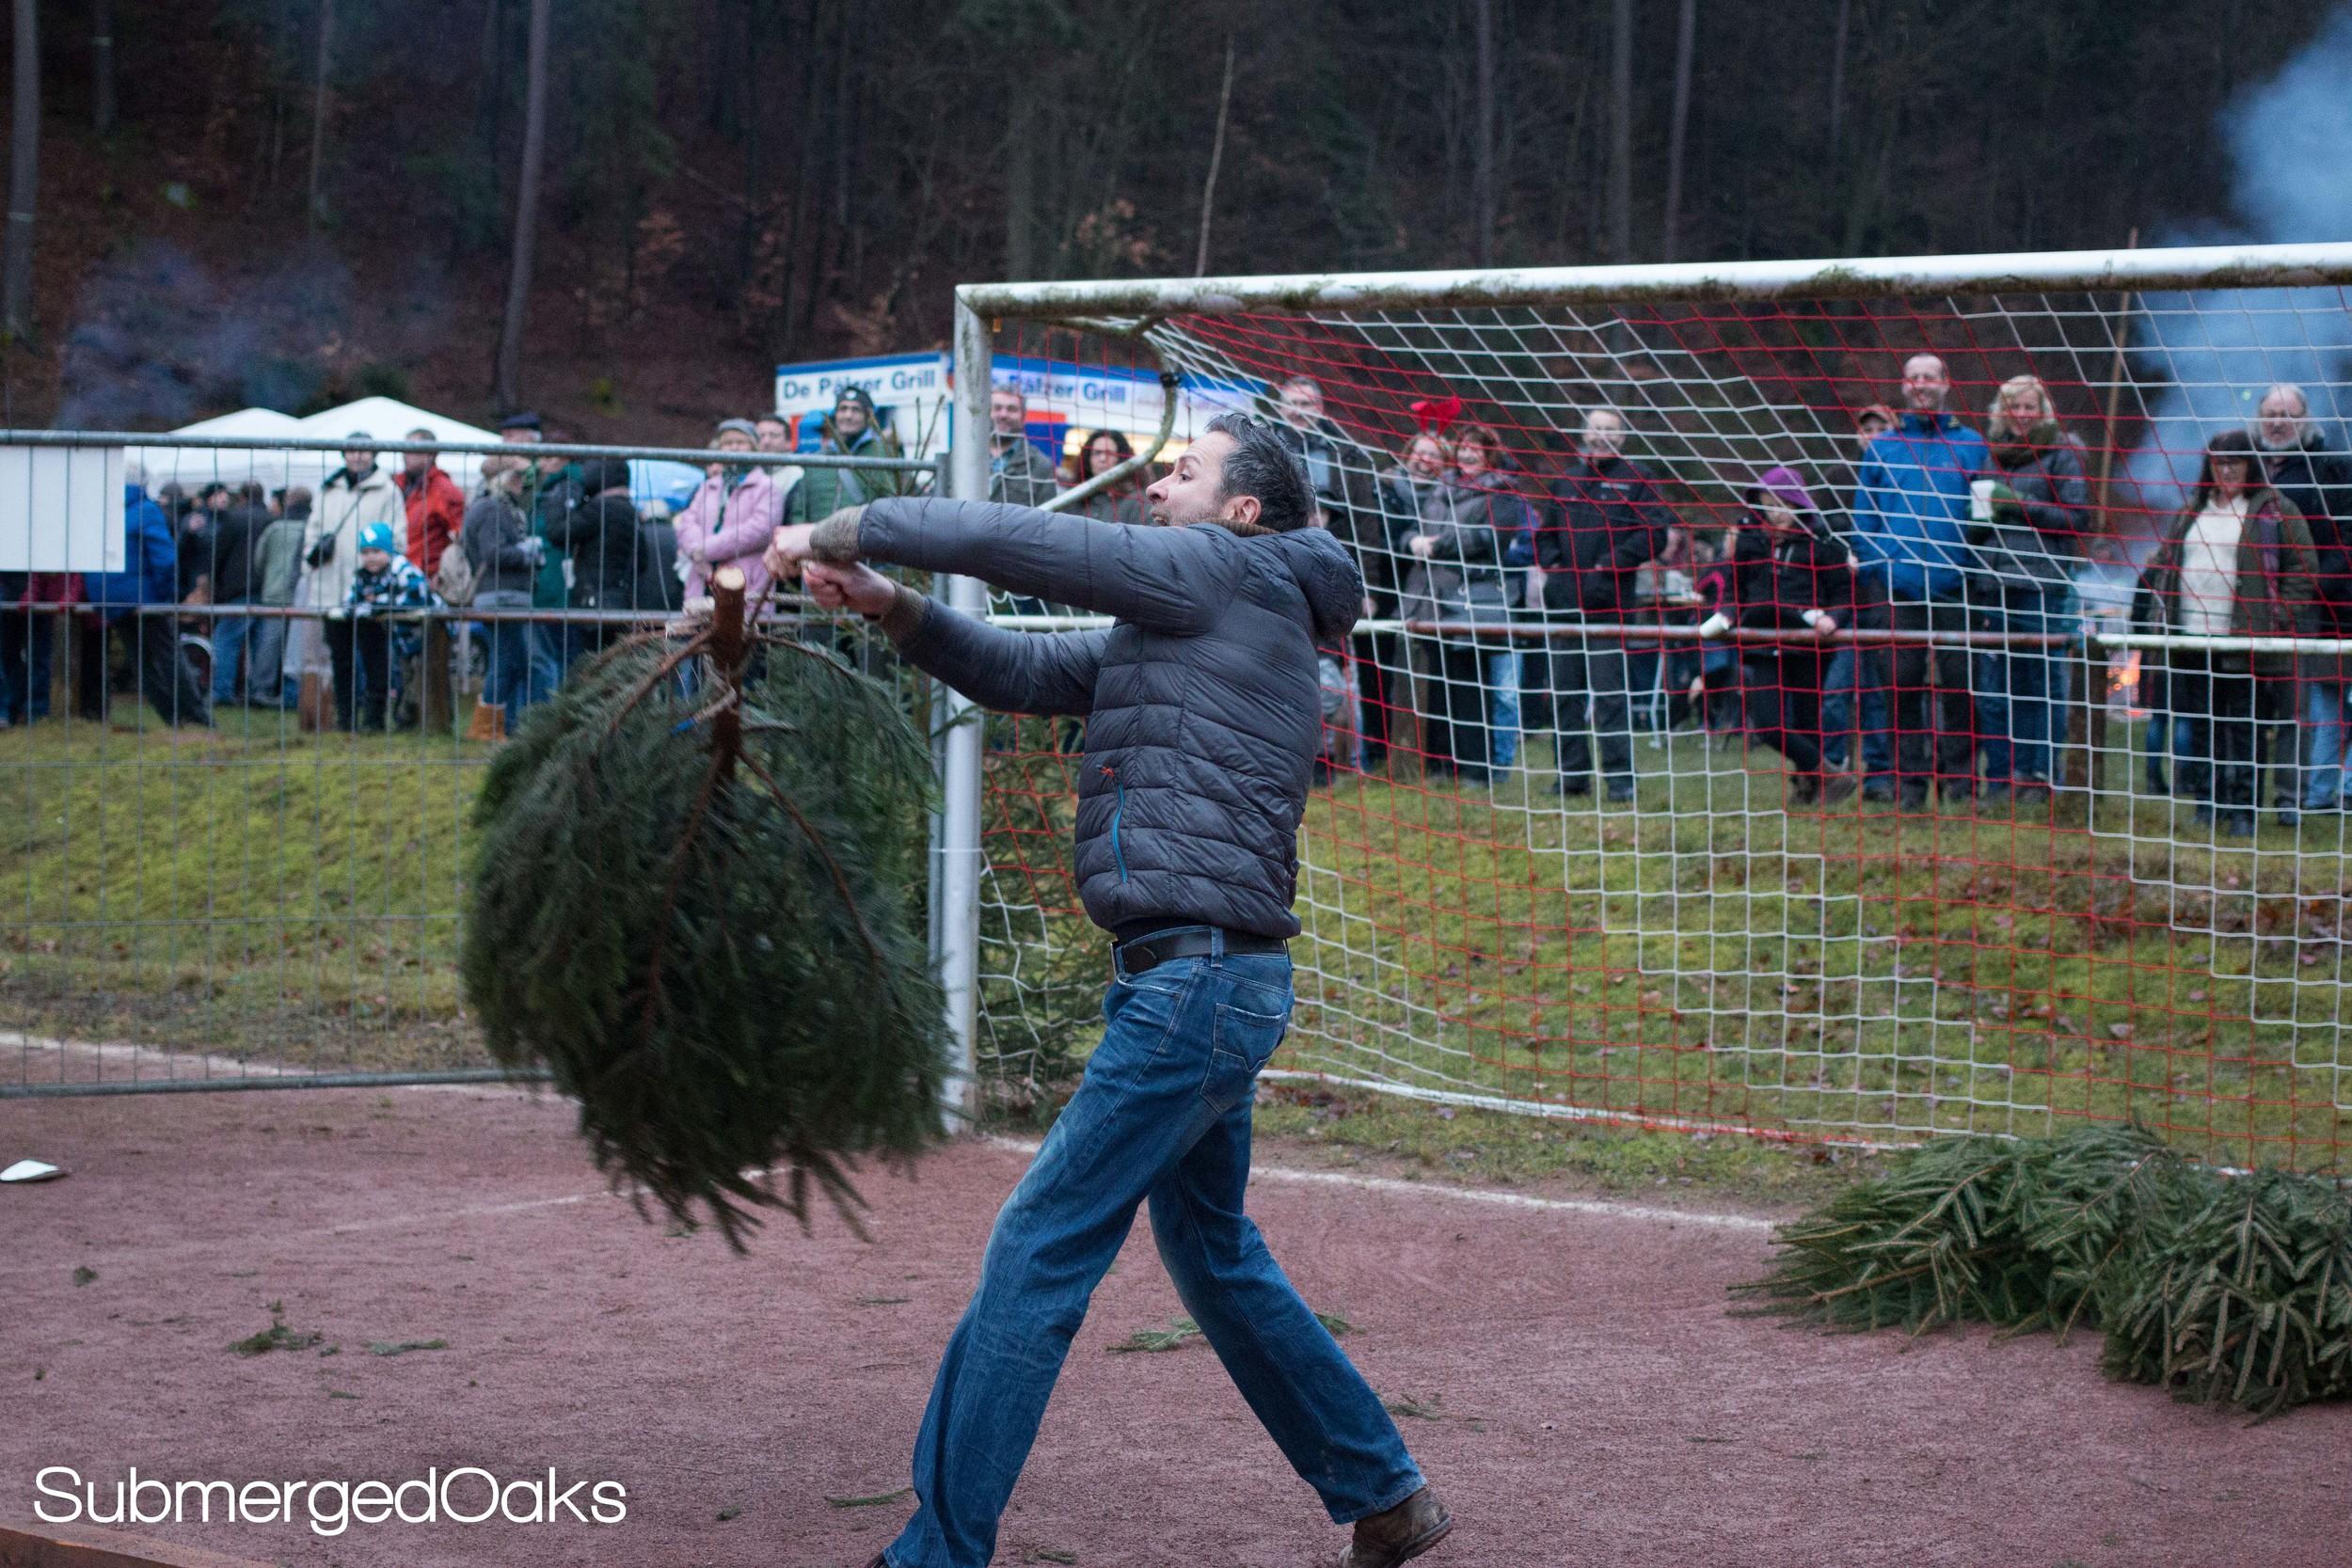 Matthias hammer throwing the Christmas tree